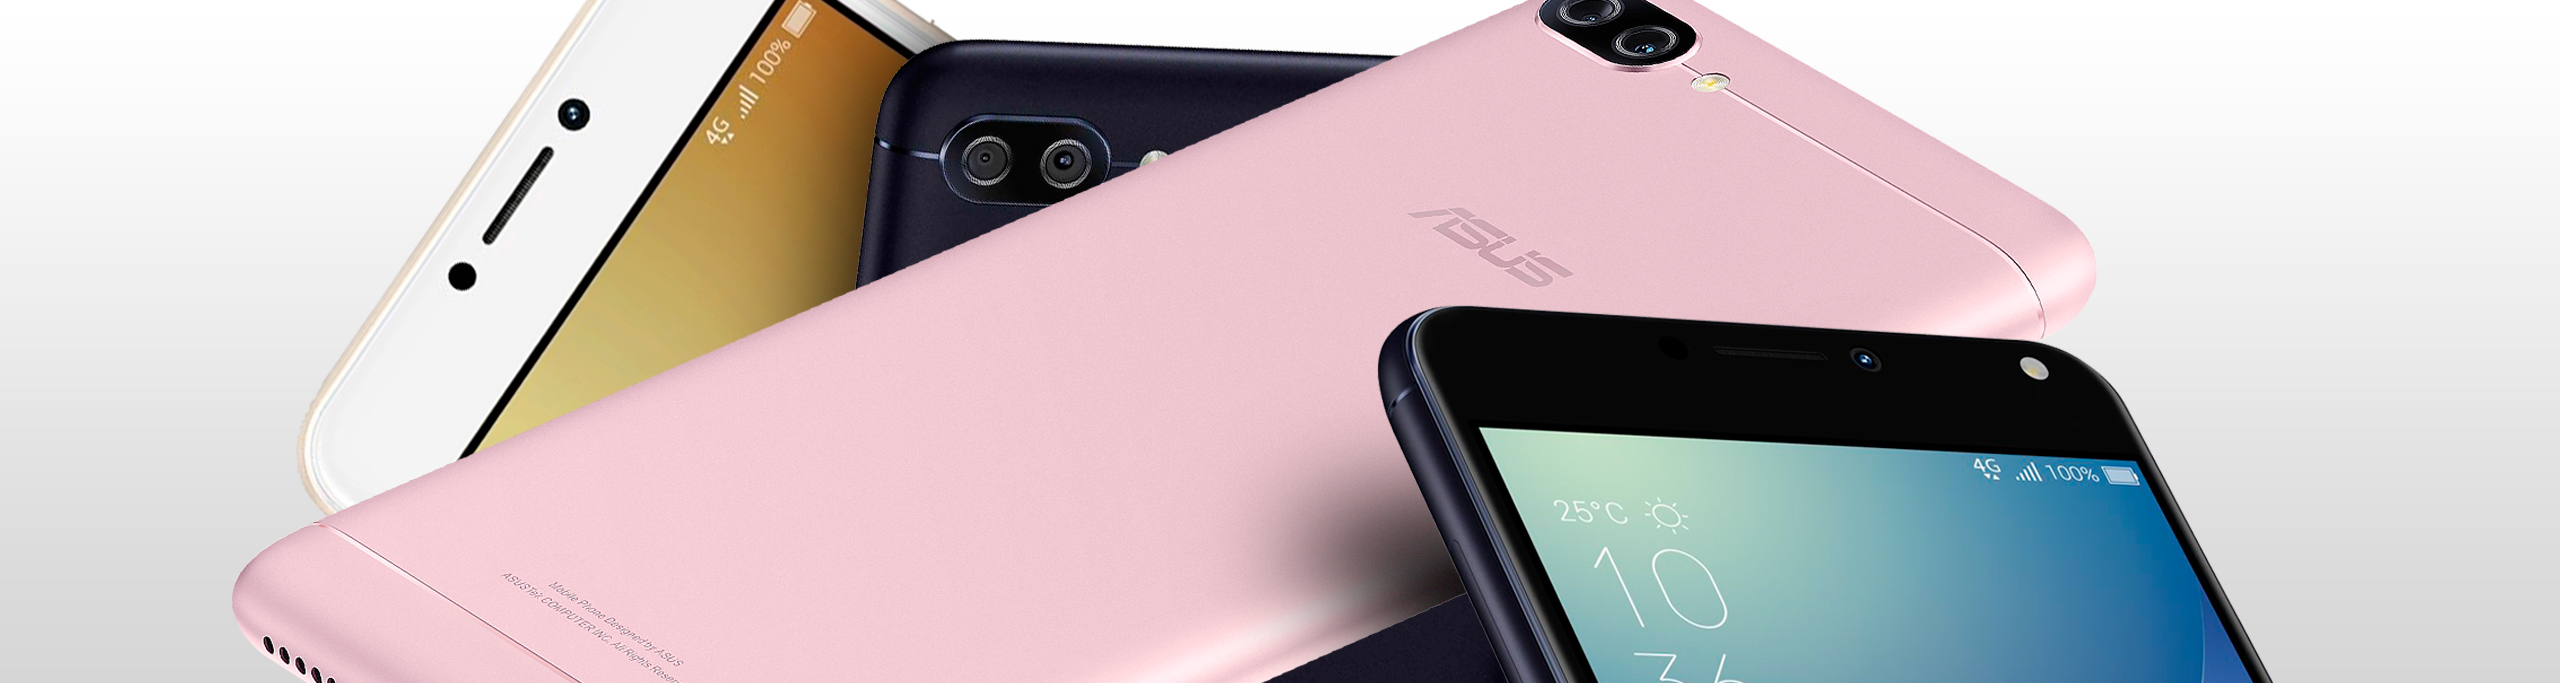 ZenFone 4 Max Plus (ZC554KL) (X00LD)